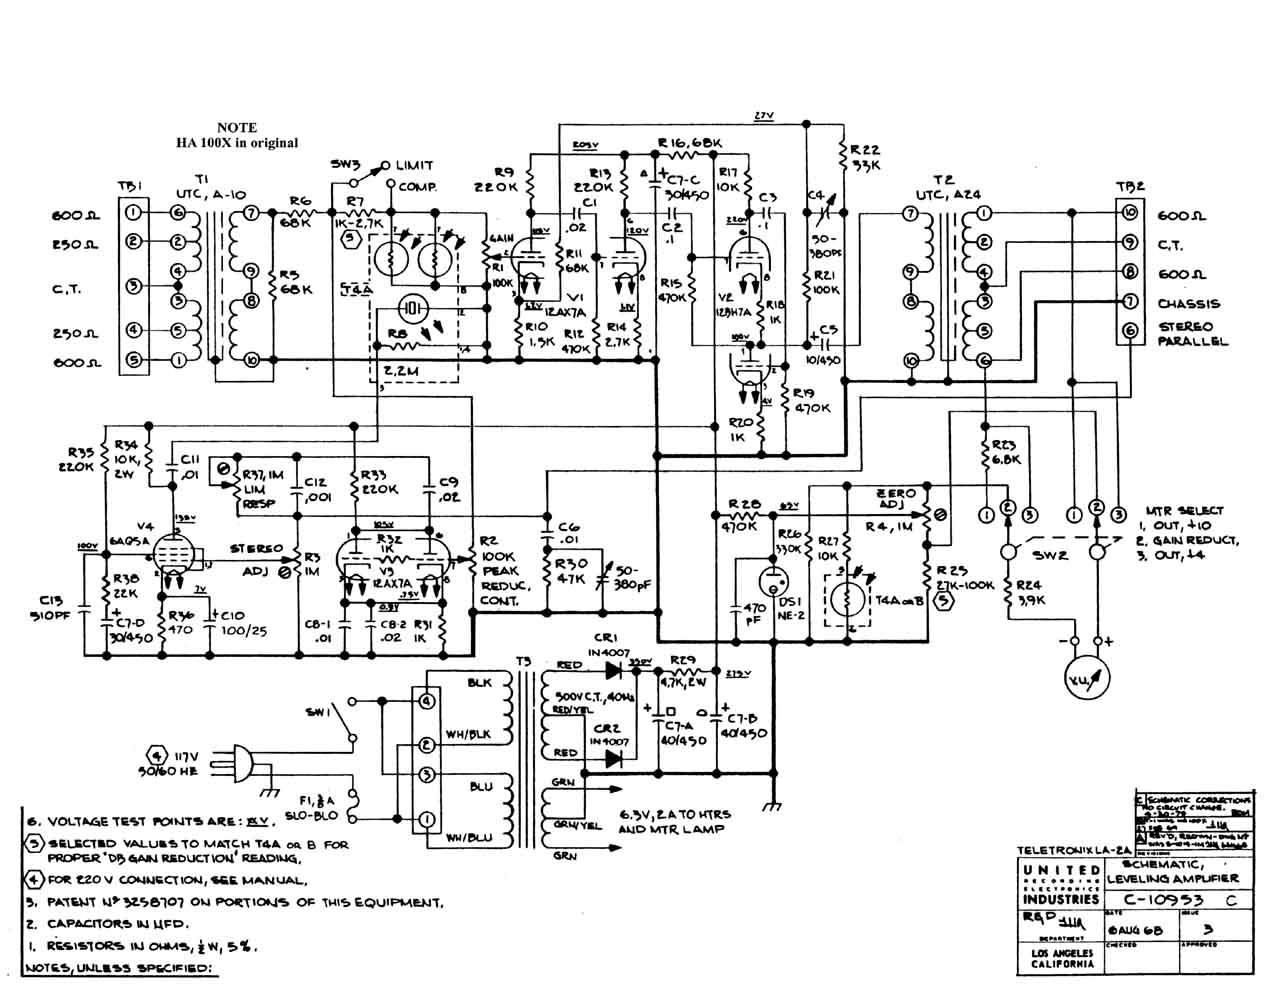 Sowter Vintage Audio Transformers Fac Compressor Wiring Diagram 150